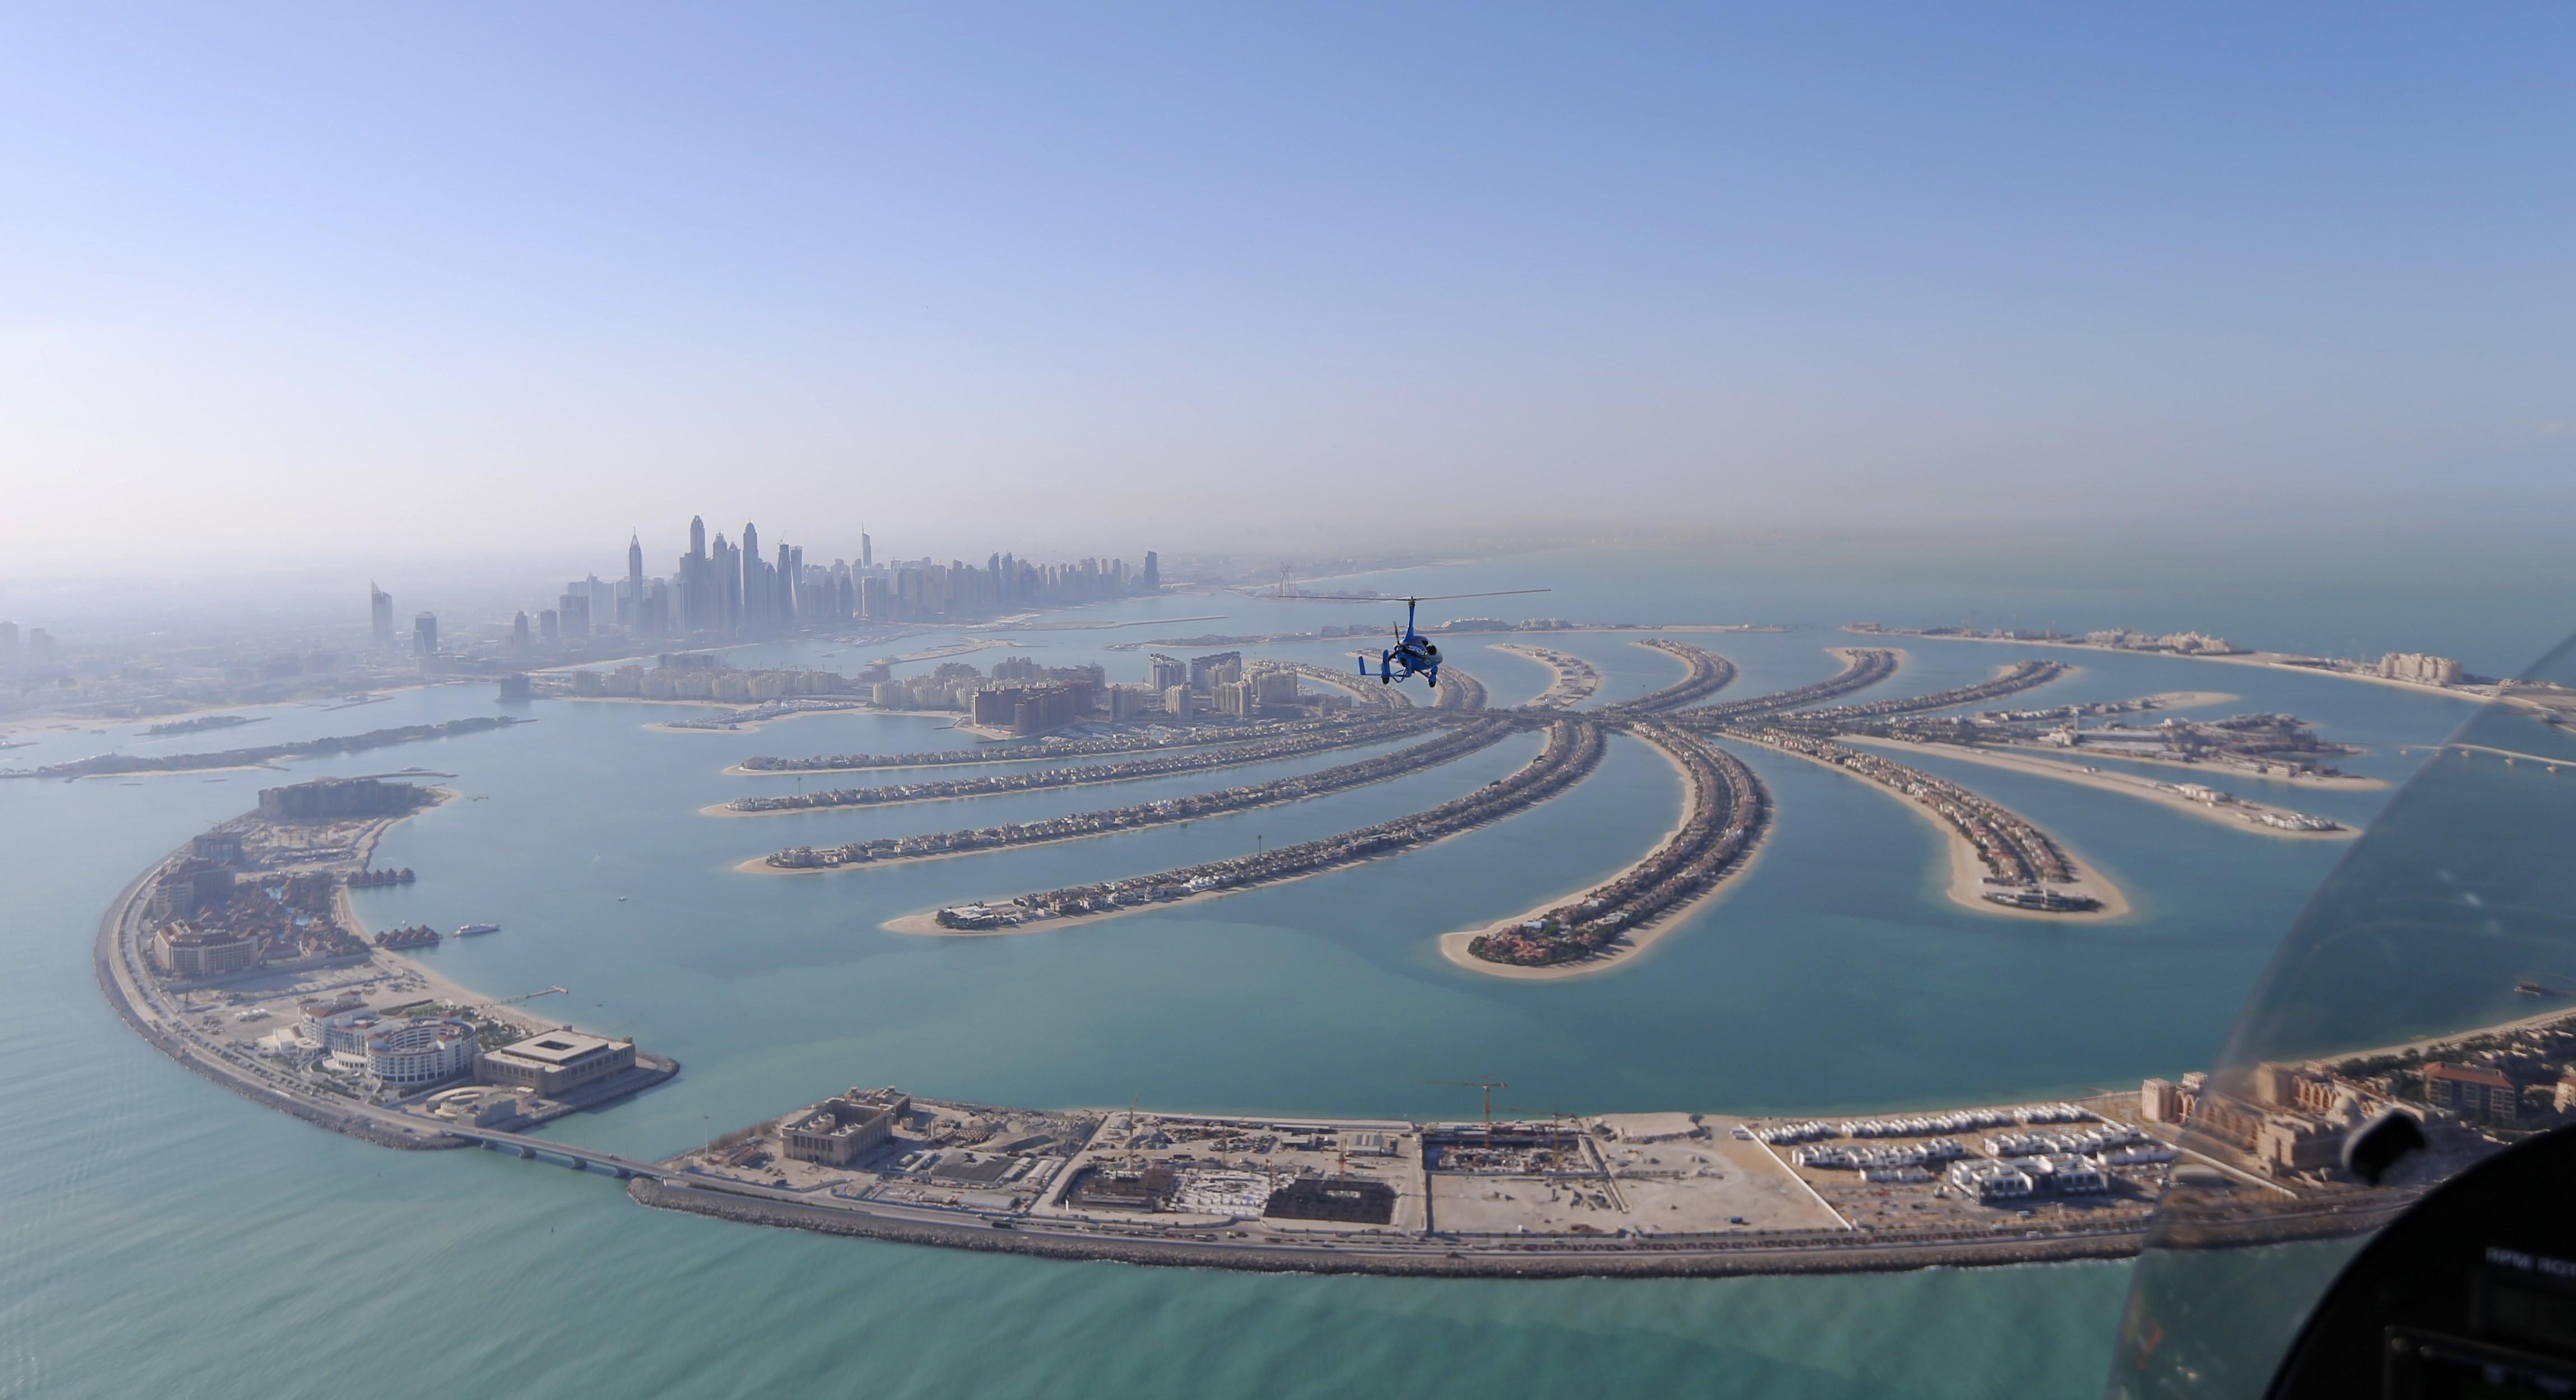 A helicopter flies over the Jumeirah neighbourhood in Dubai, UAE December 9, 2015.